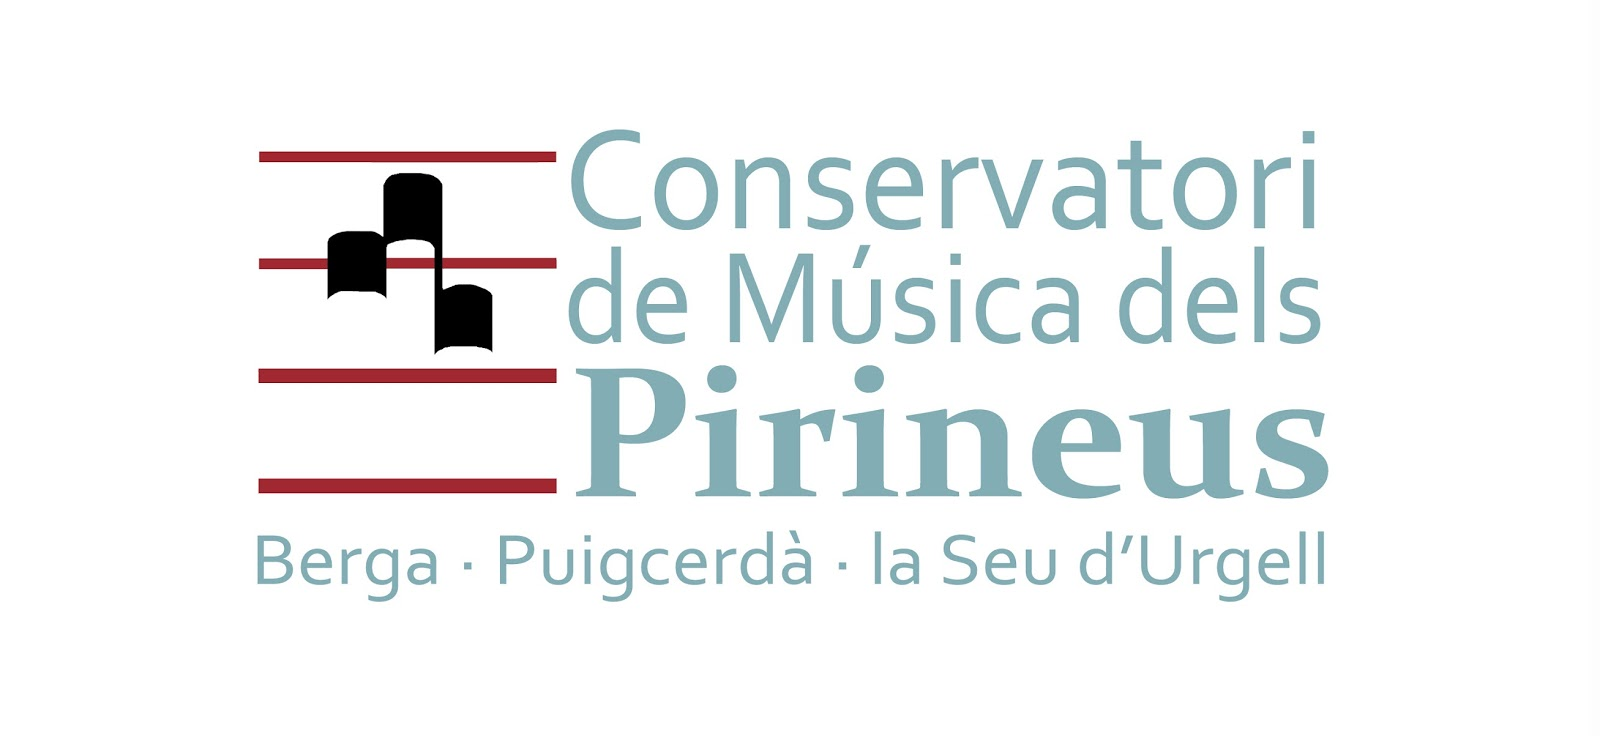 CMPirineus logo color3 copia